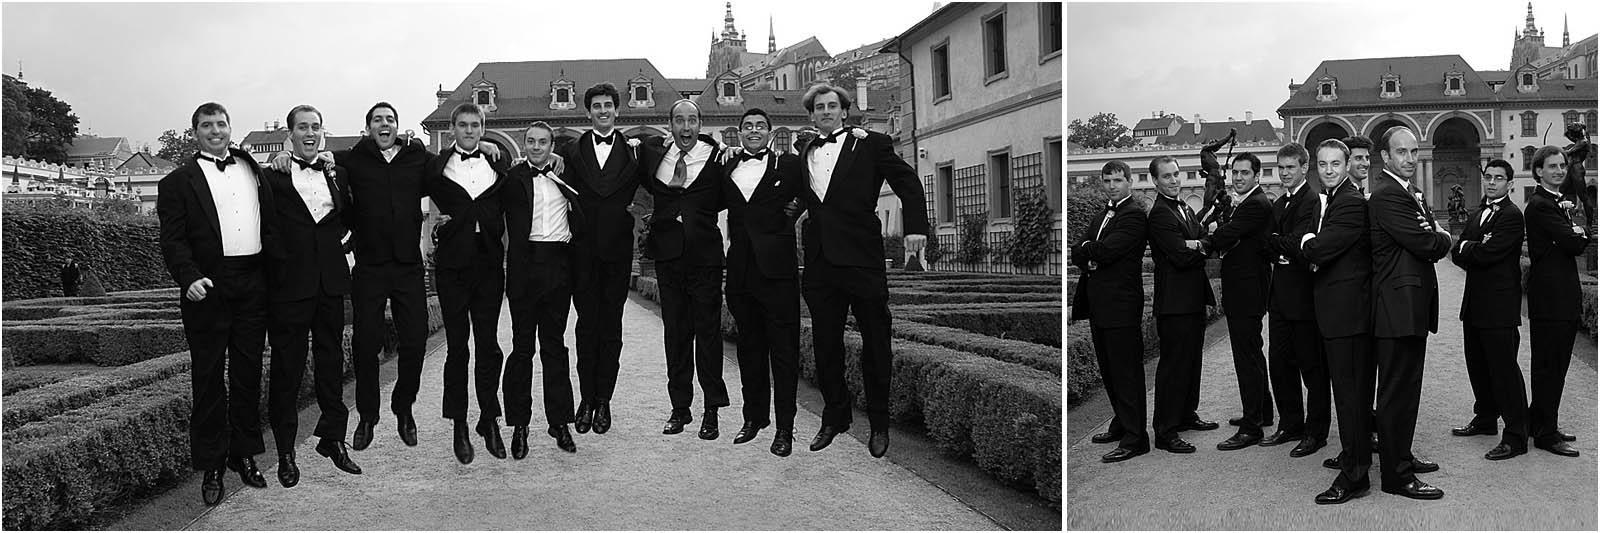 black-and-white-wedding-photos-editing-example